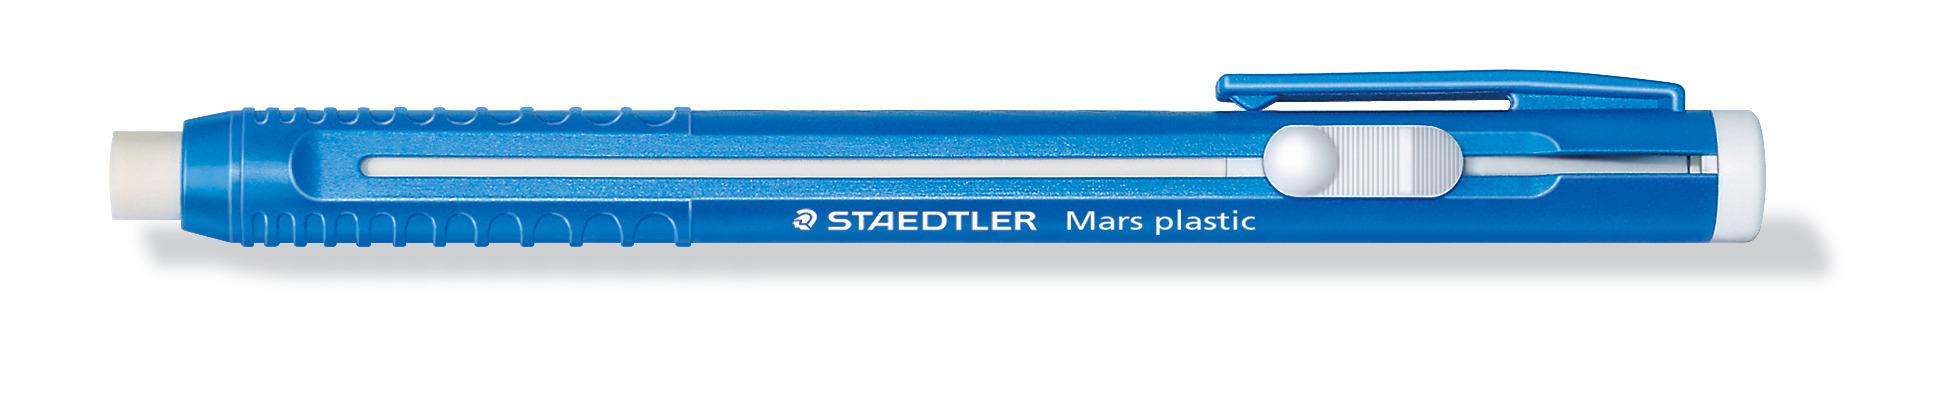 Borracha Mars plastic 528 - STAEDTLER